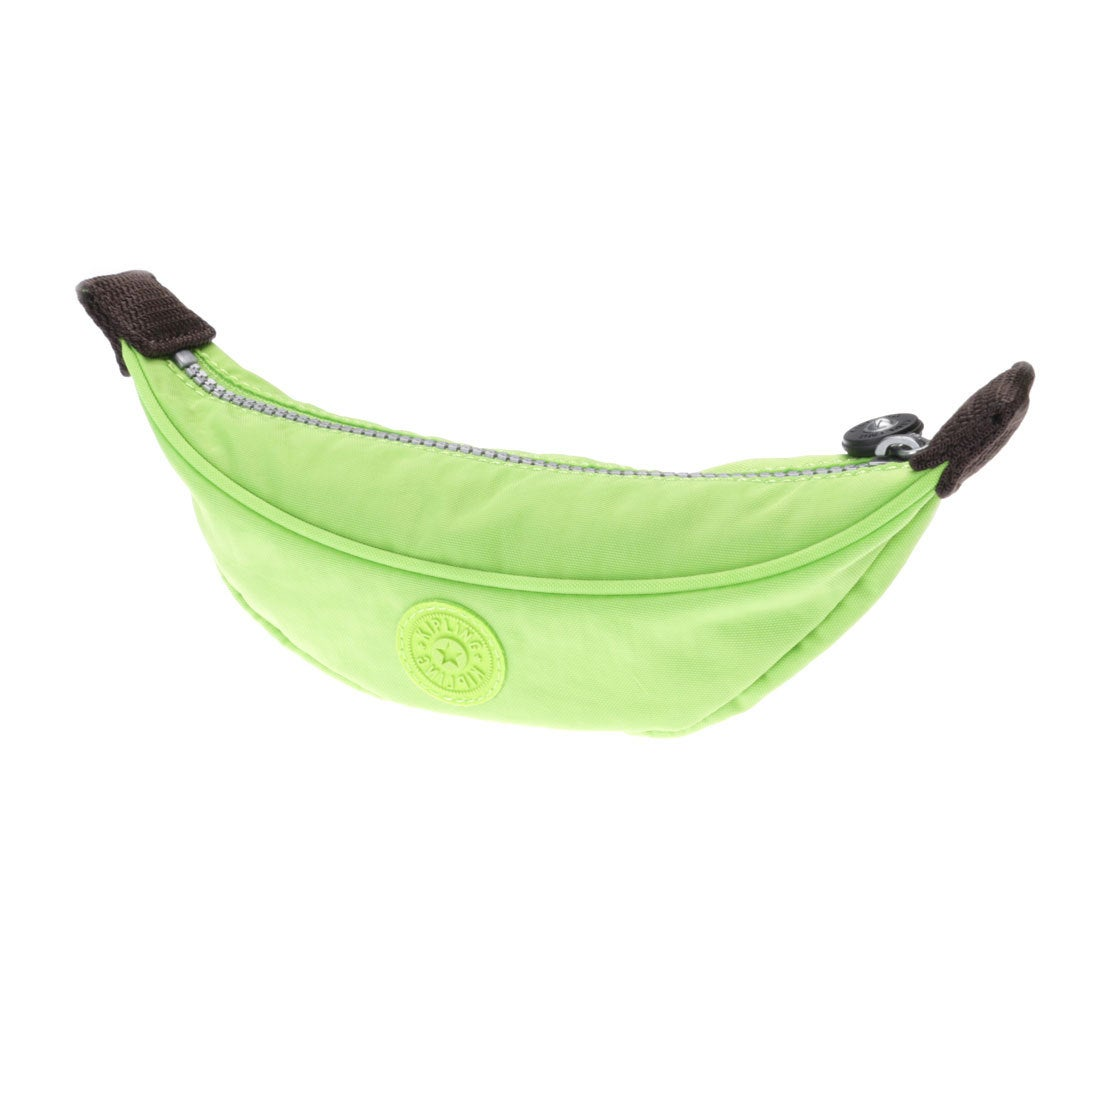 【SALE 20%OFF】キプリング Kipling BANANA (Banana Green) レディース